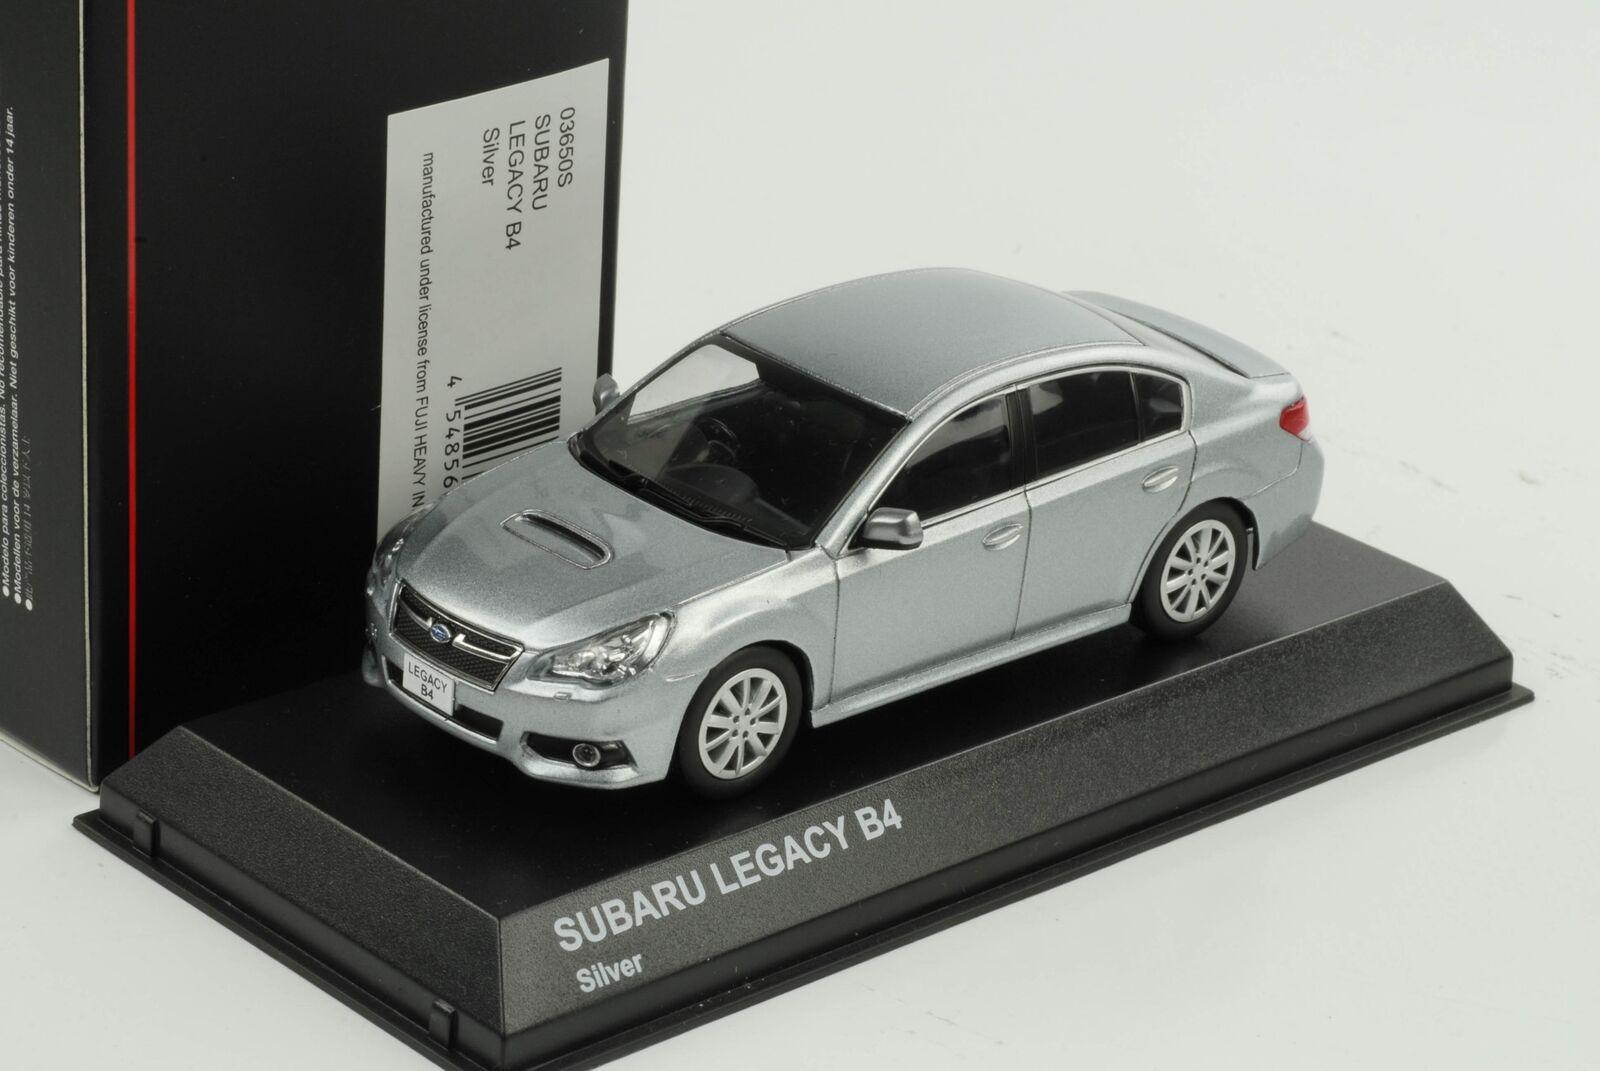 Subaru Legacy B4 Glace silver Métallique 1 43 Kyosho Diecast